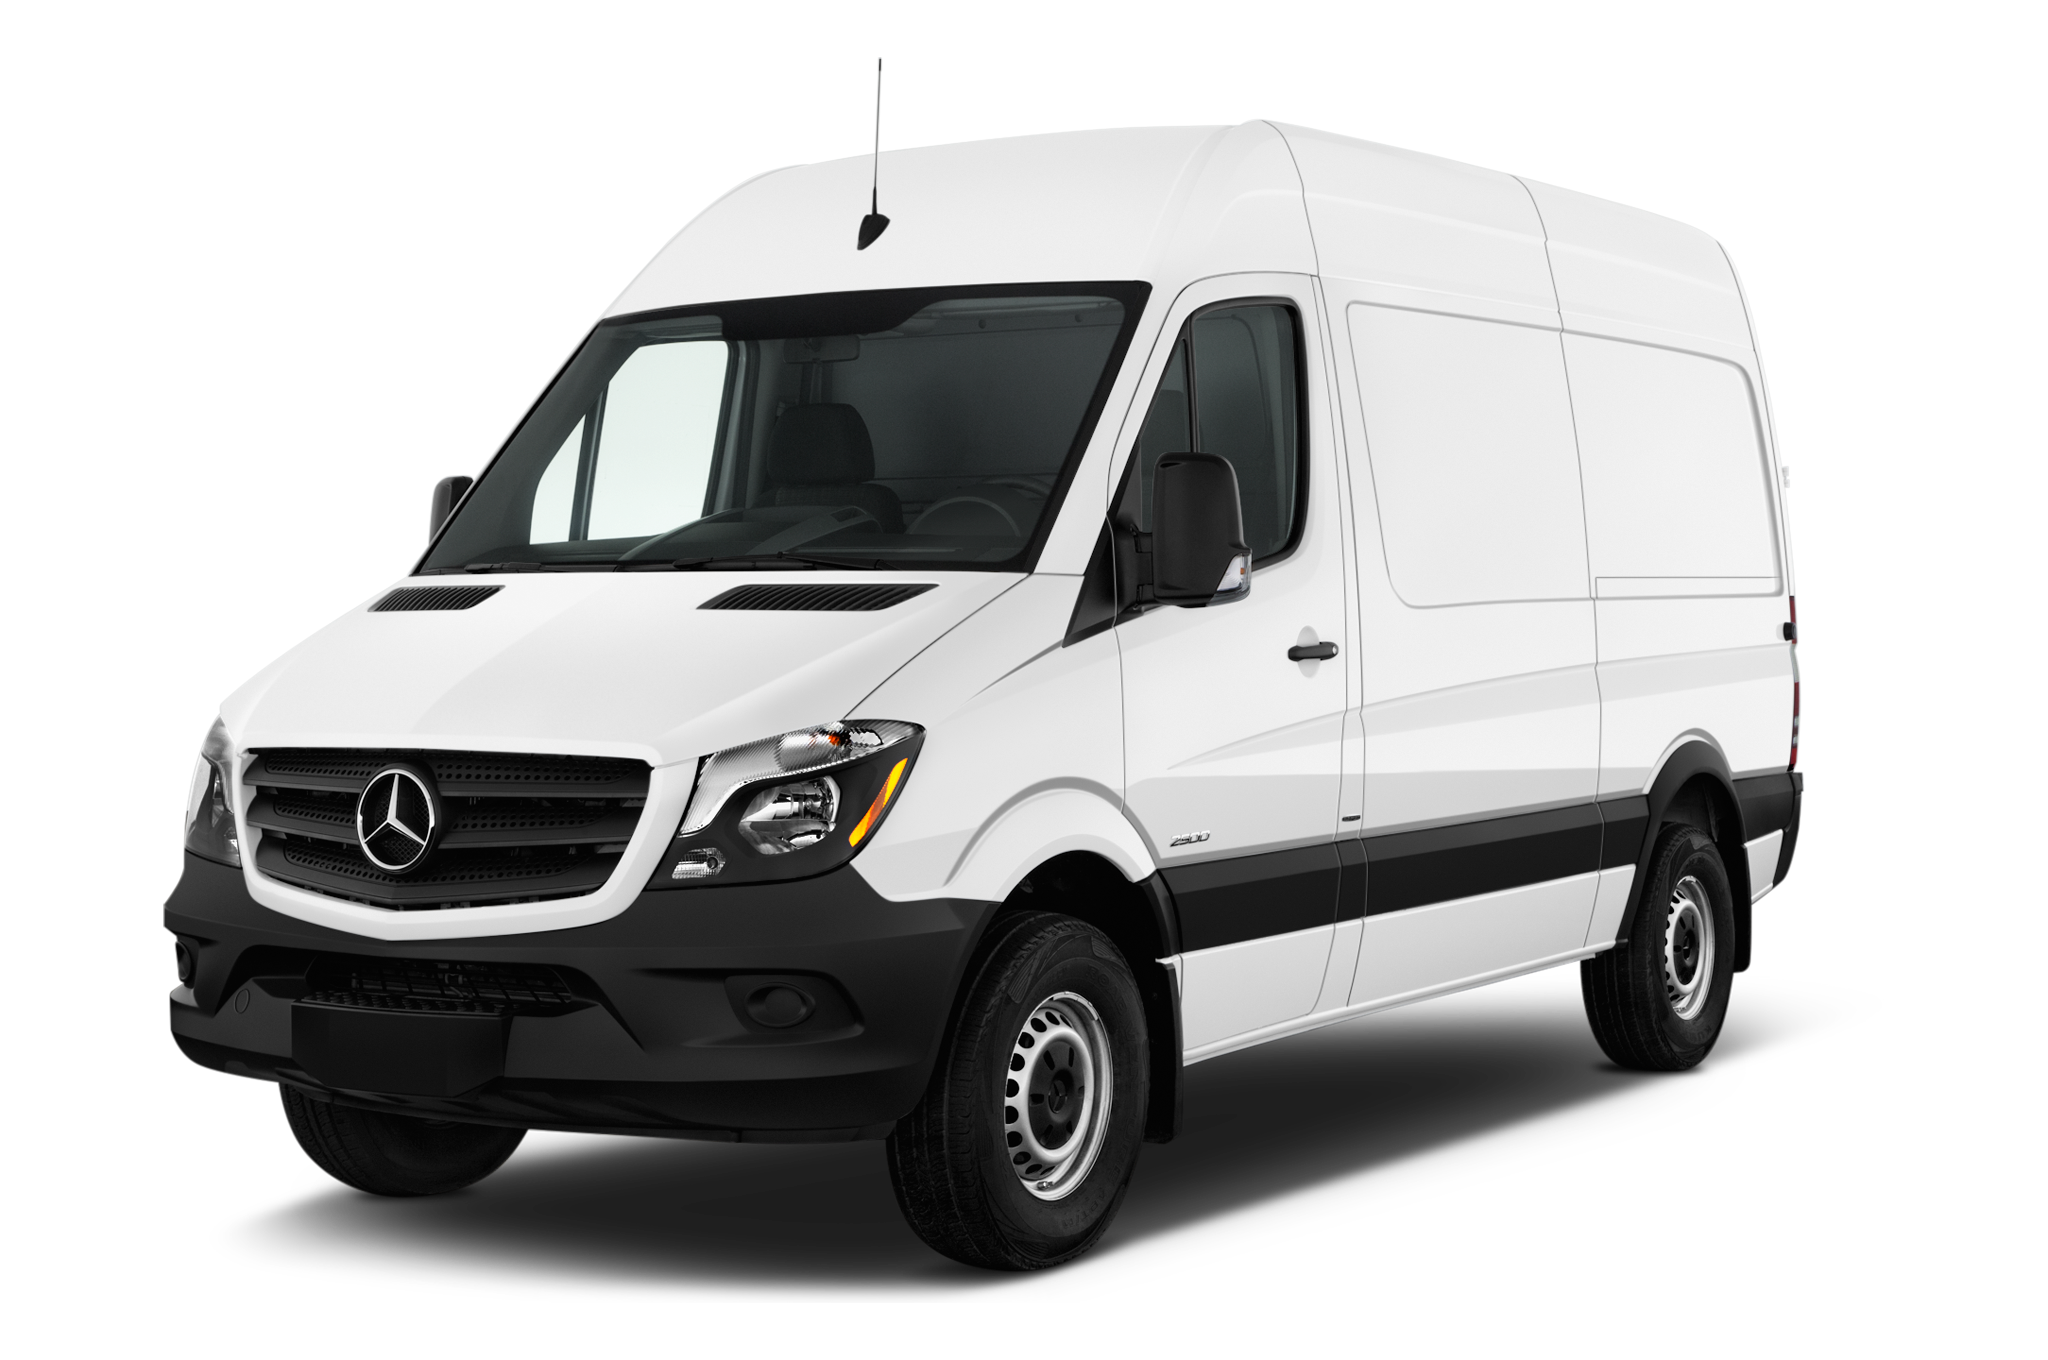 2017 mercedes benz sprinter cargo van 3500 170 wb ext high roof overview msn autos. Black Bedroom Furniture Sets. Home Design Ideas